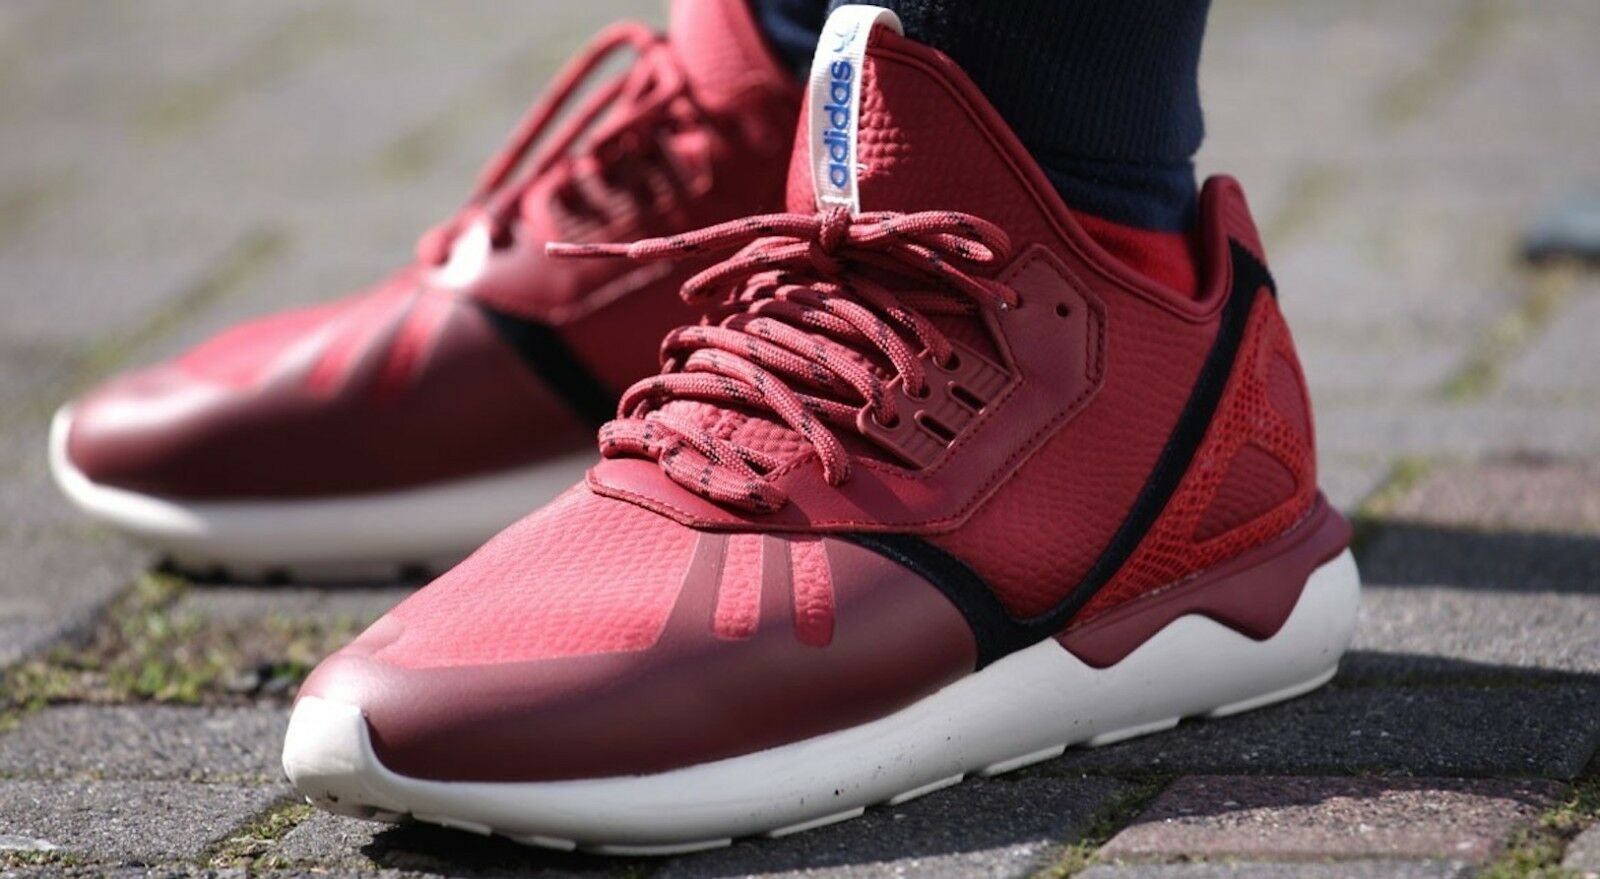 Adidas TUBULAR Running Shoe St Nomad B35642 Red/Red/Core Black B35642 Nomad Sz 13 NEW 4a6275